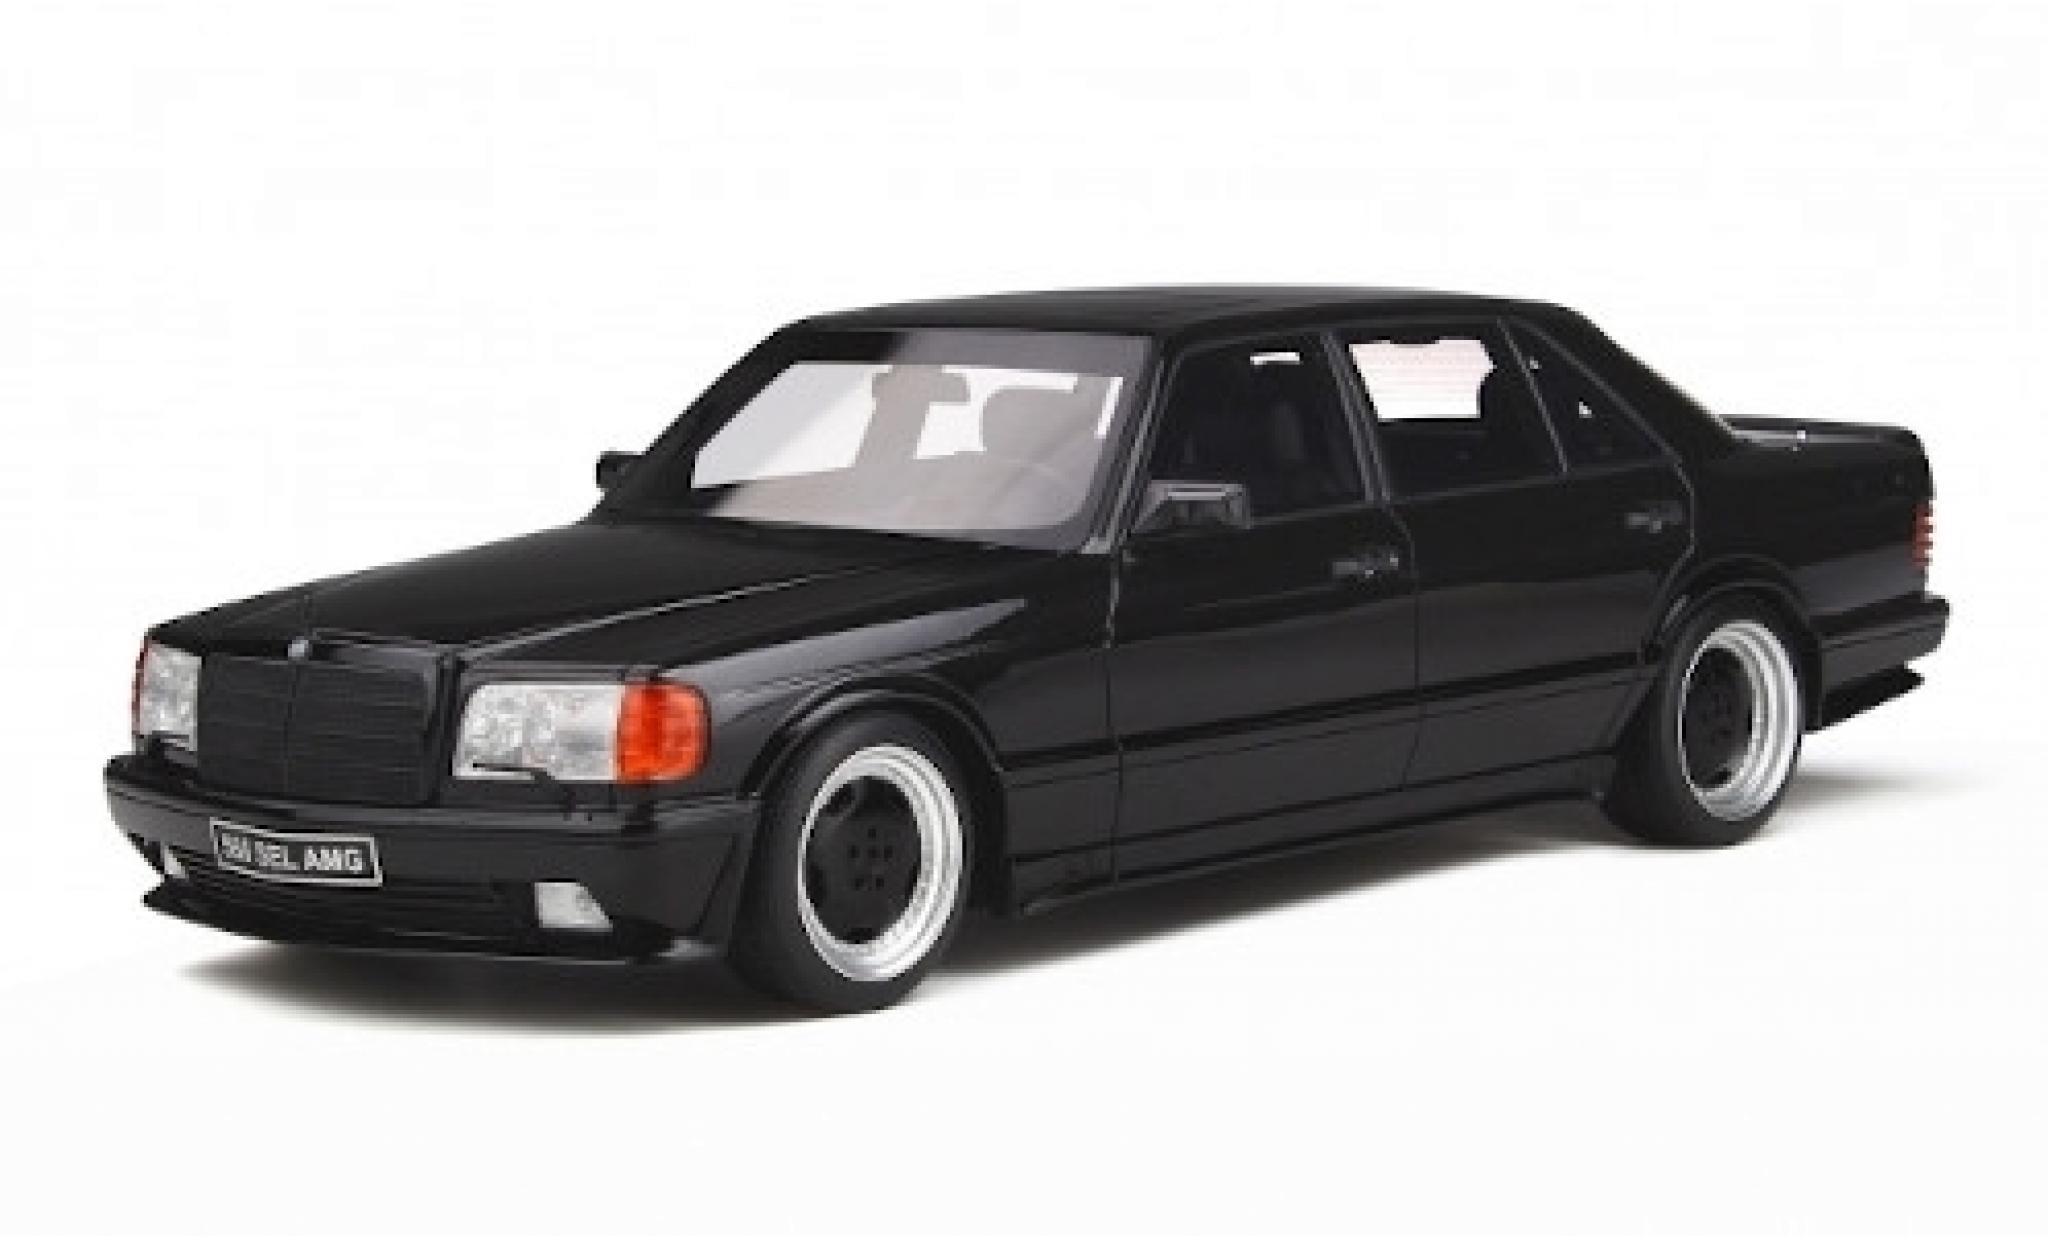 Mercedes 560 1/18 Ottomobile 6.0 SEL AMG (W126) metallise noire